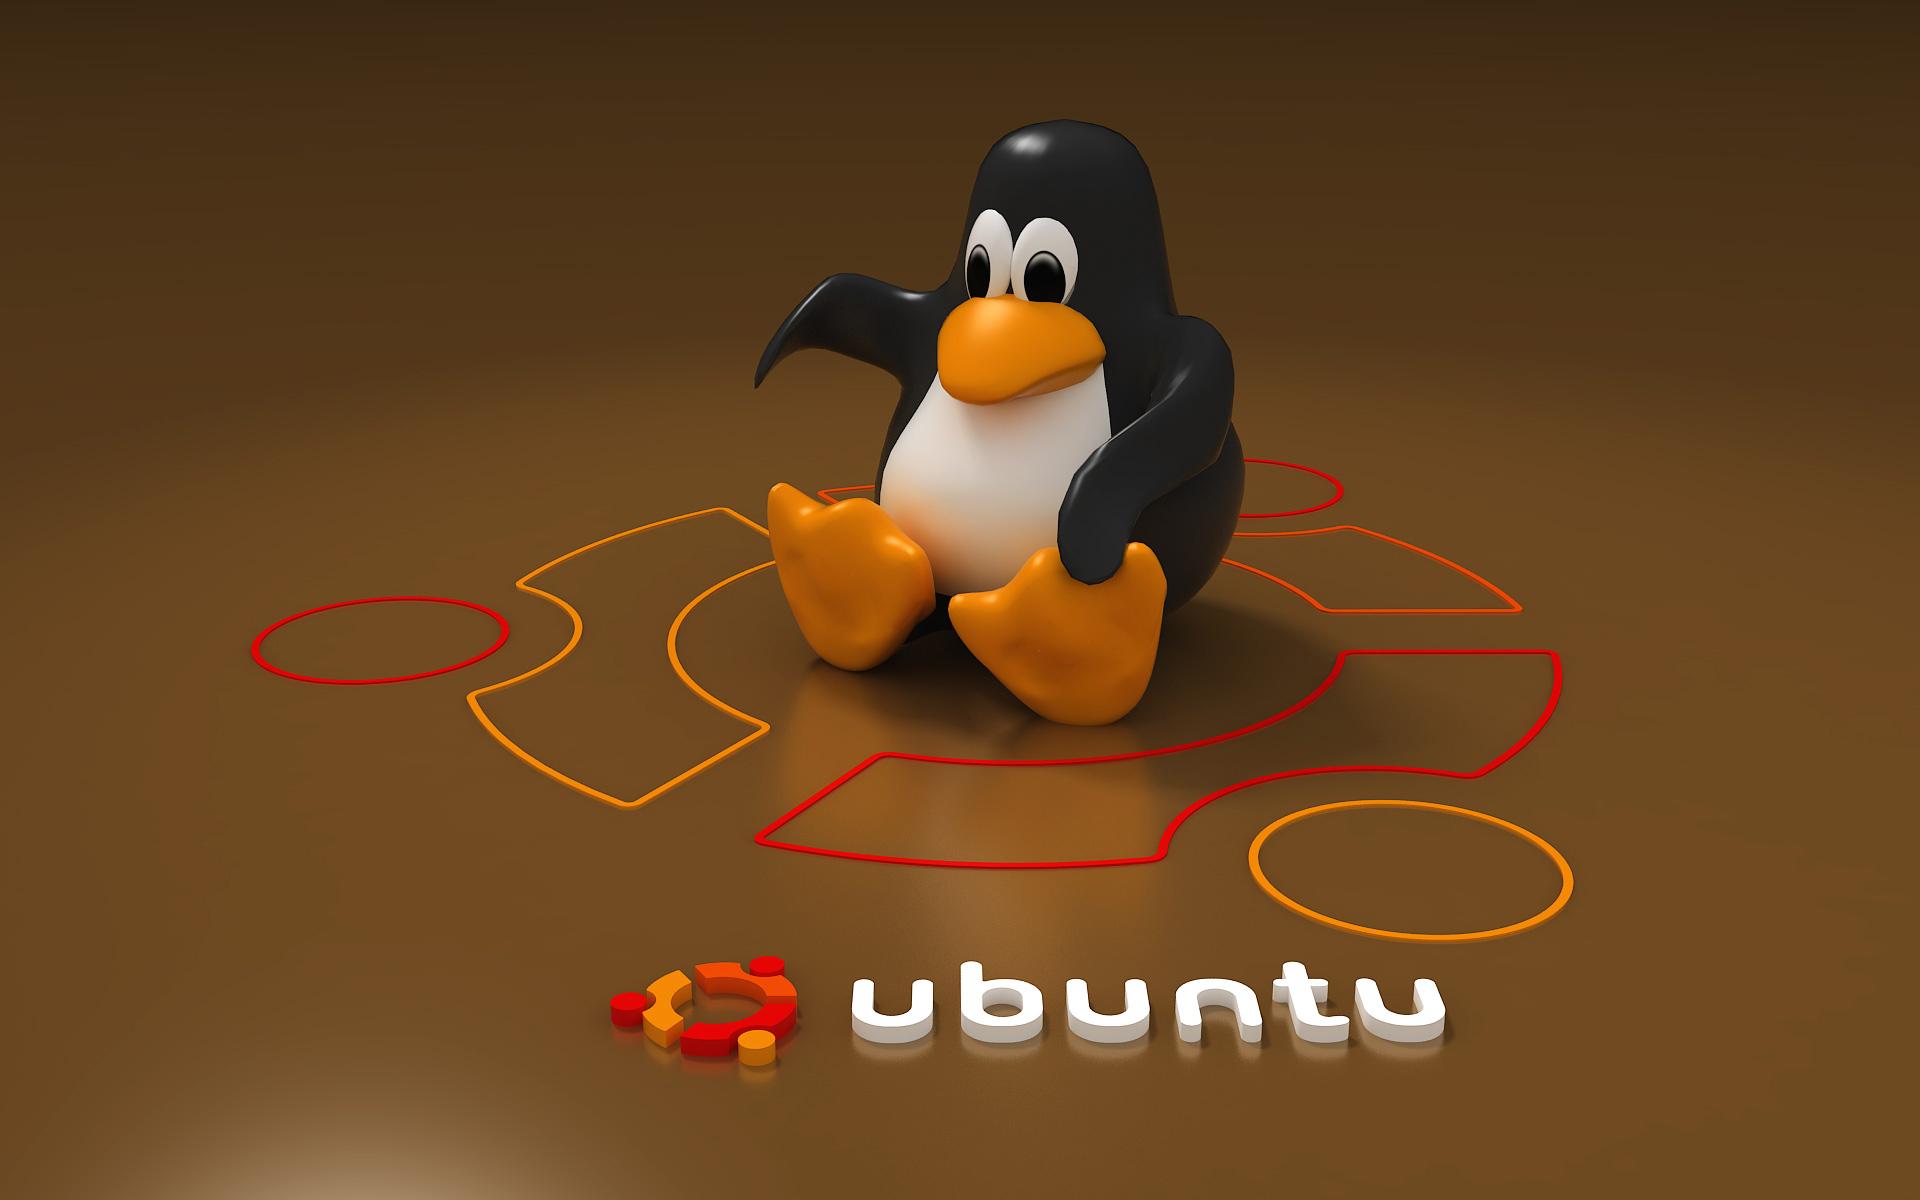 apt-get-install-wordpress-and-Cloud-Installation-of-WordPress-on-Ubuntu